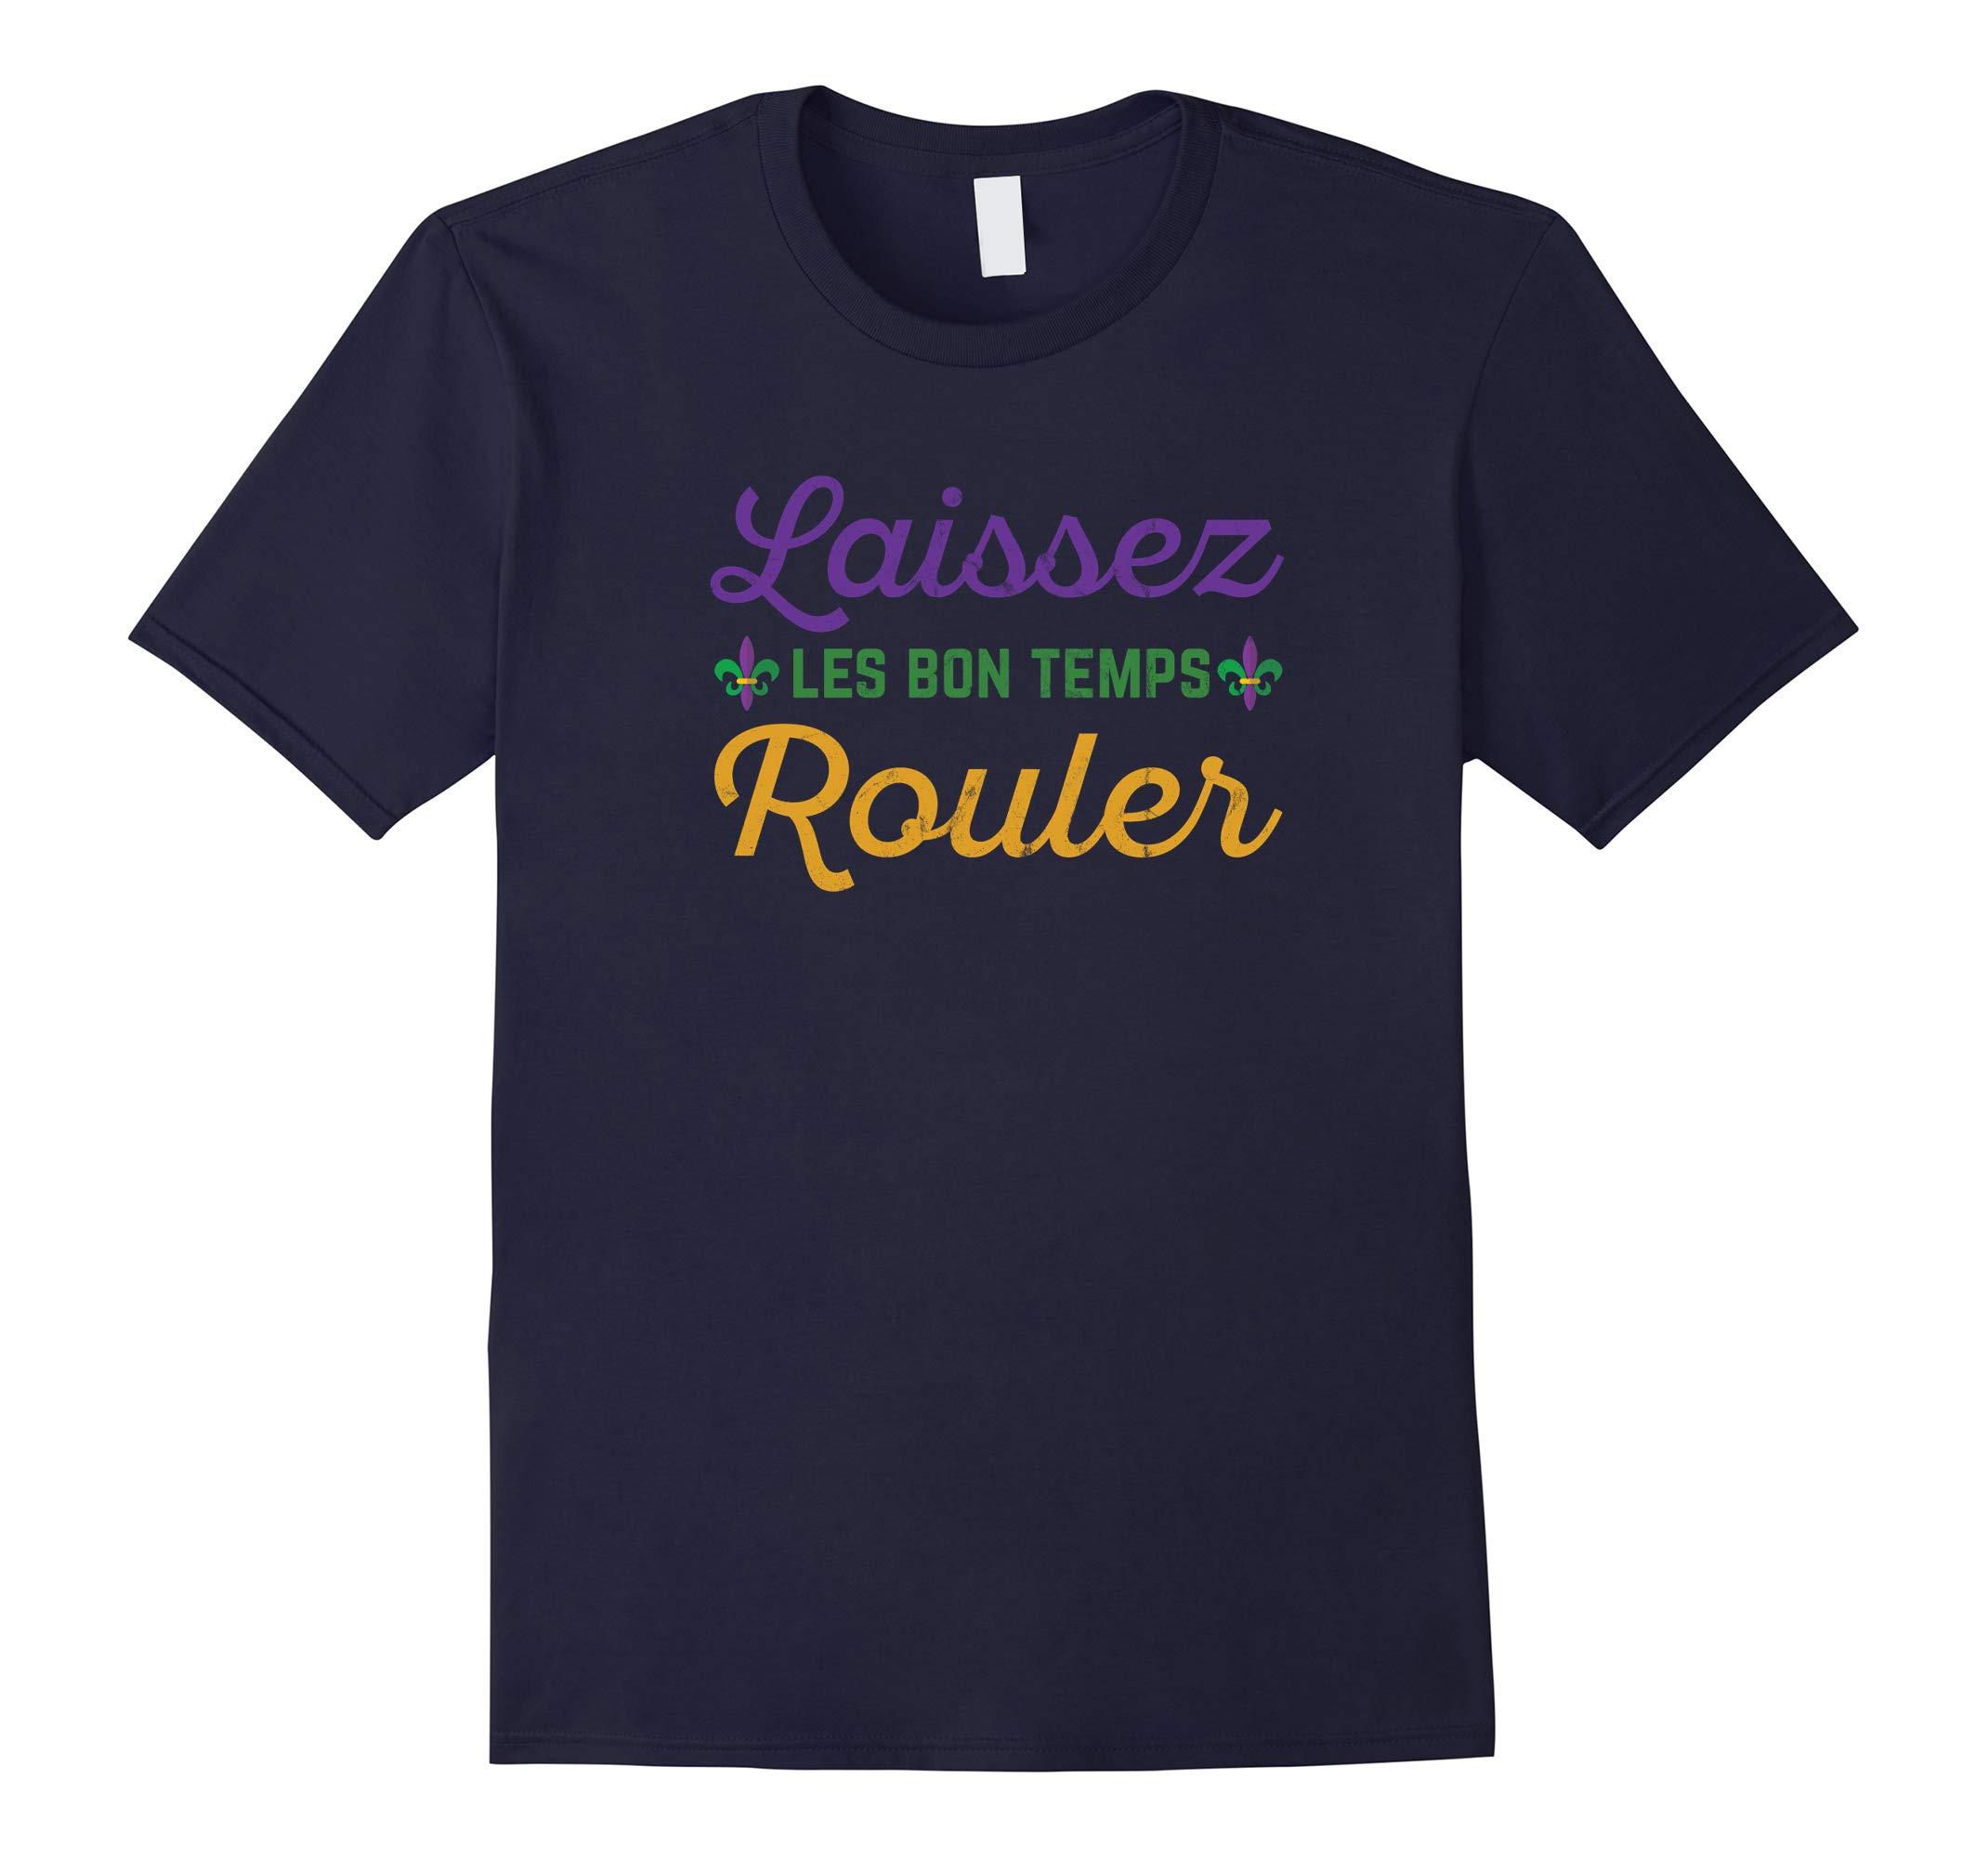 Mardi Gras Shirt Let the Good Times Roll-RT